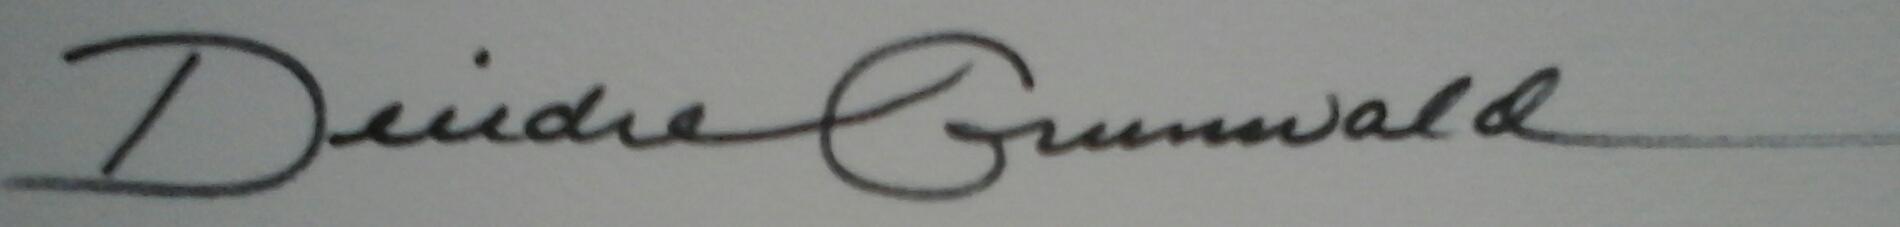 Deirdre Grunwald's Signature